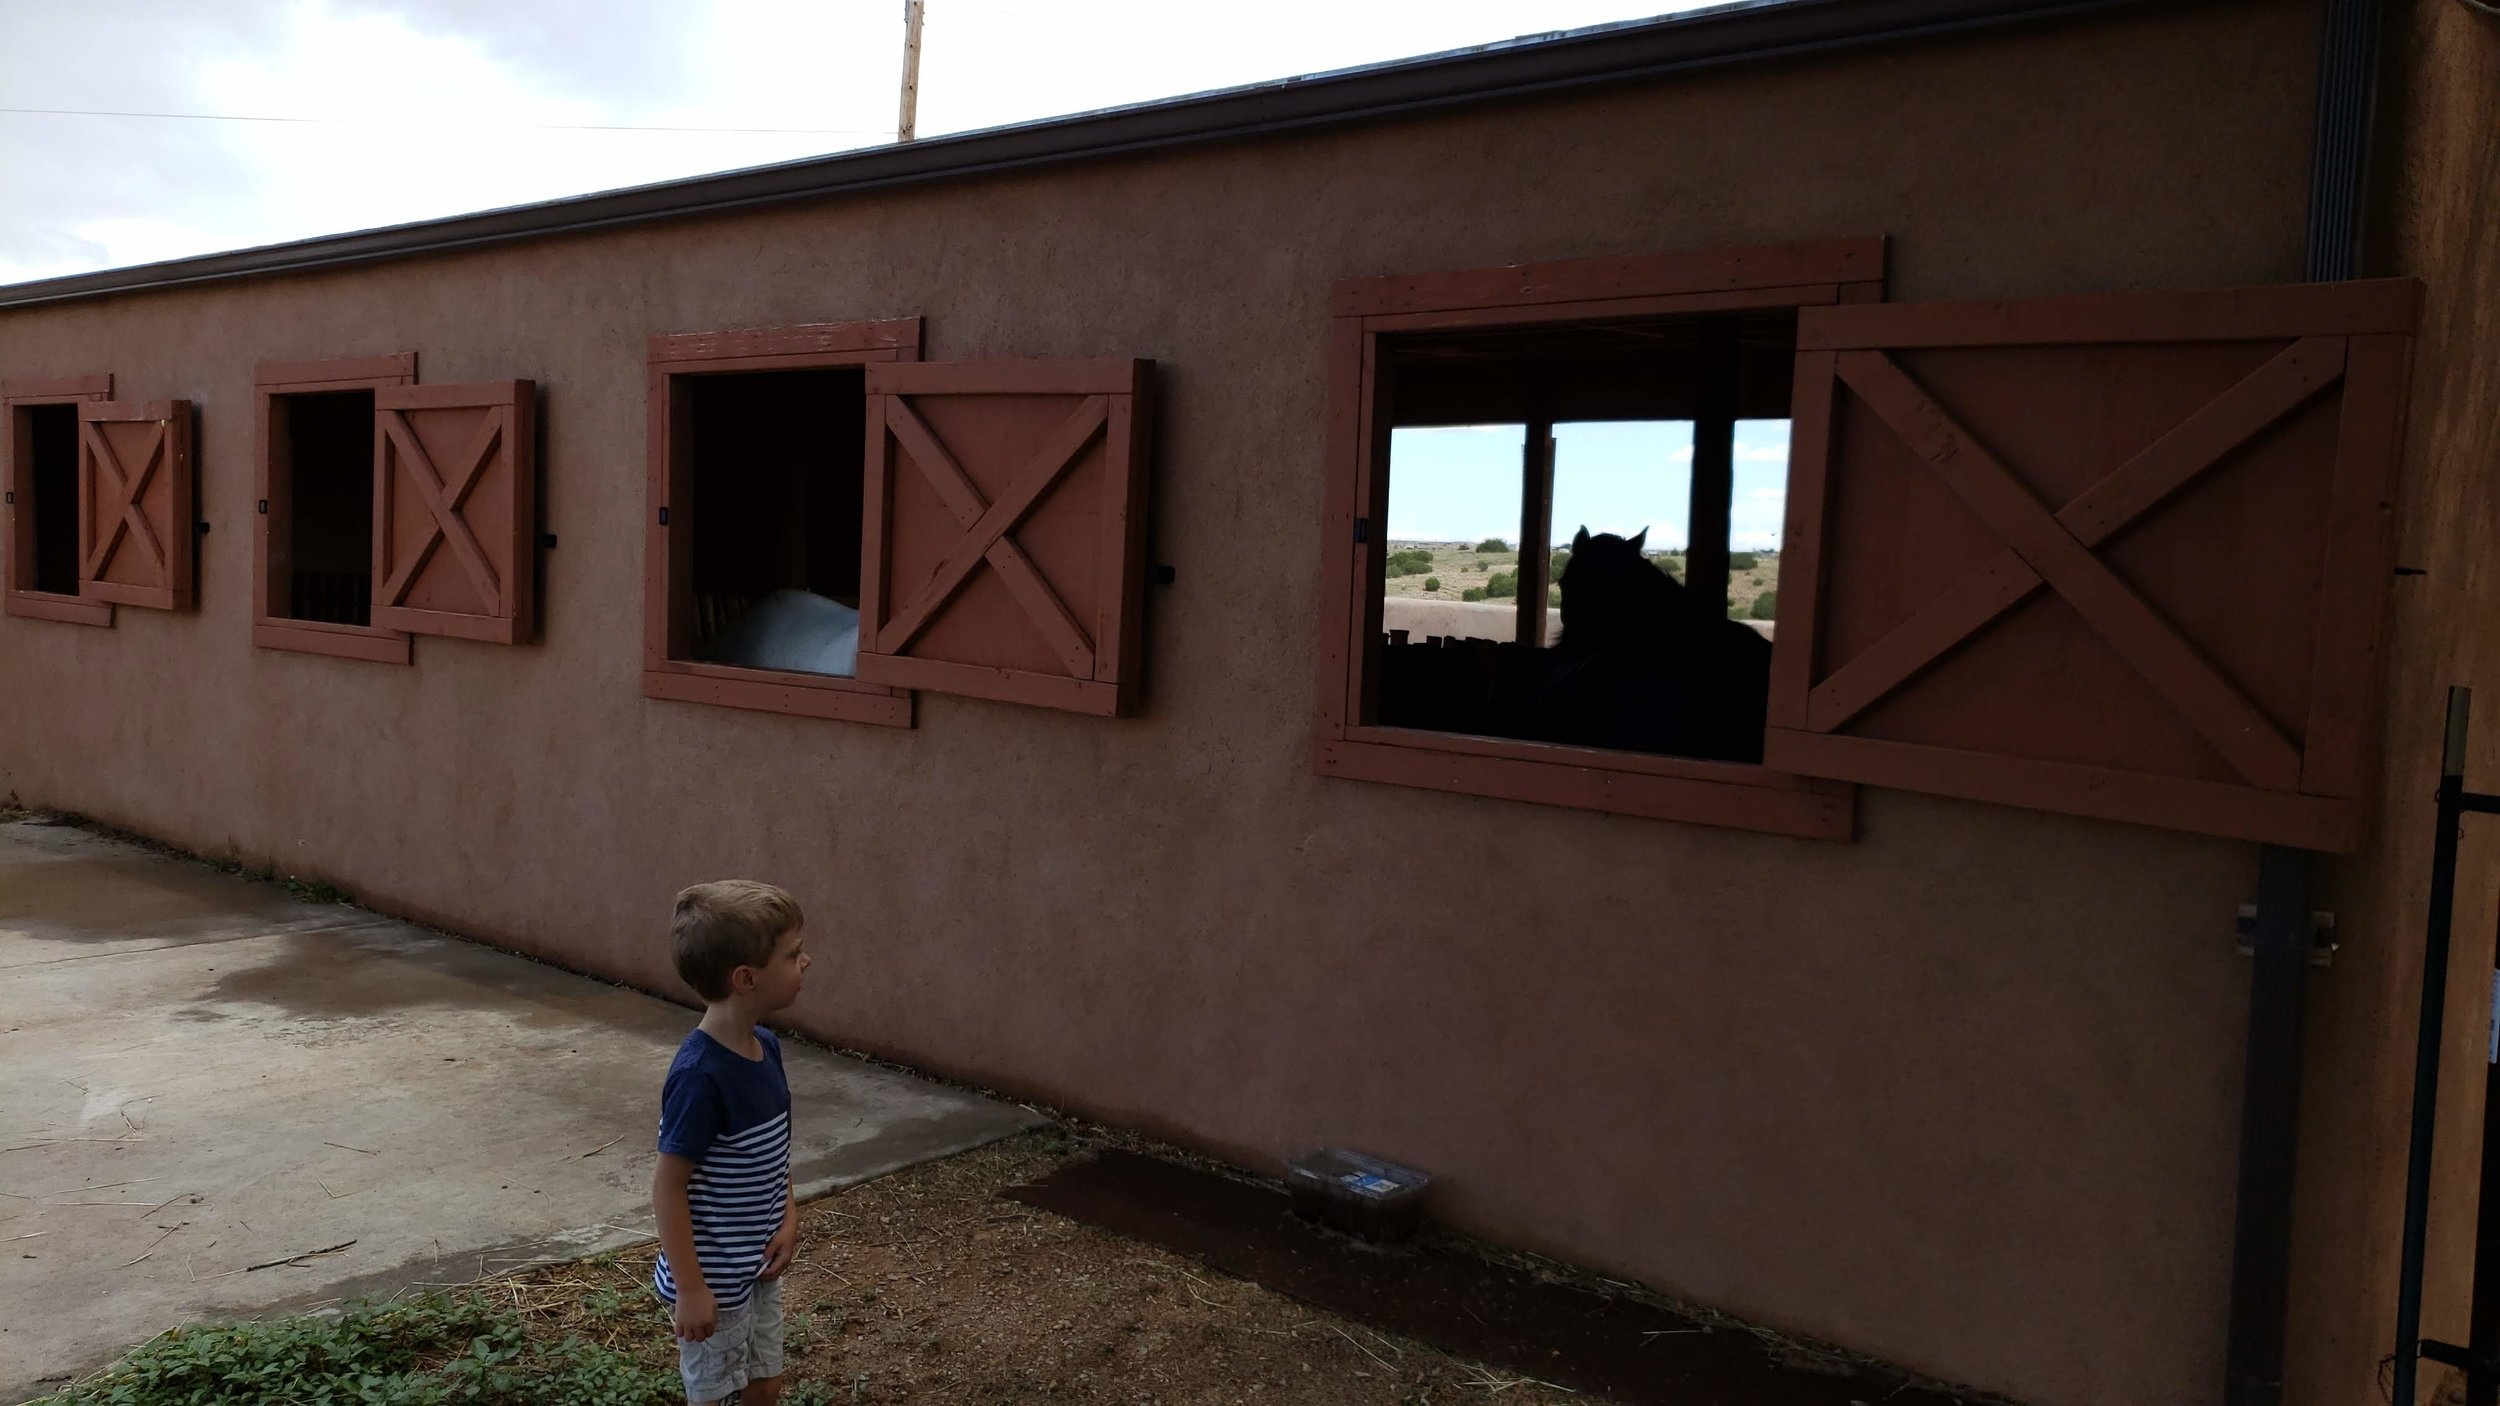 Santa Fe Airbnb